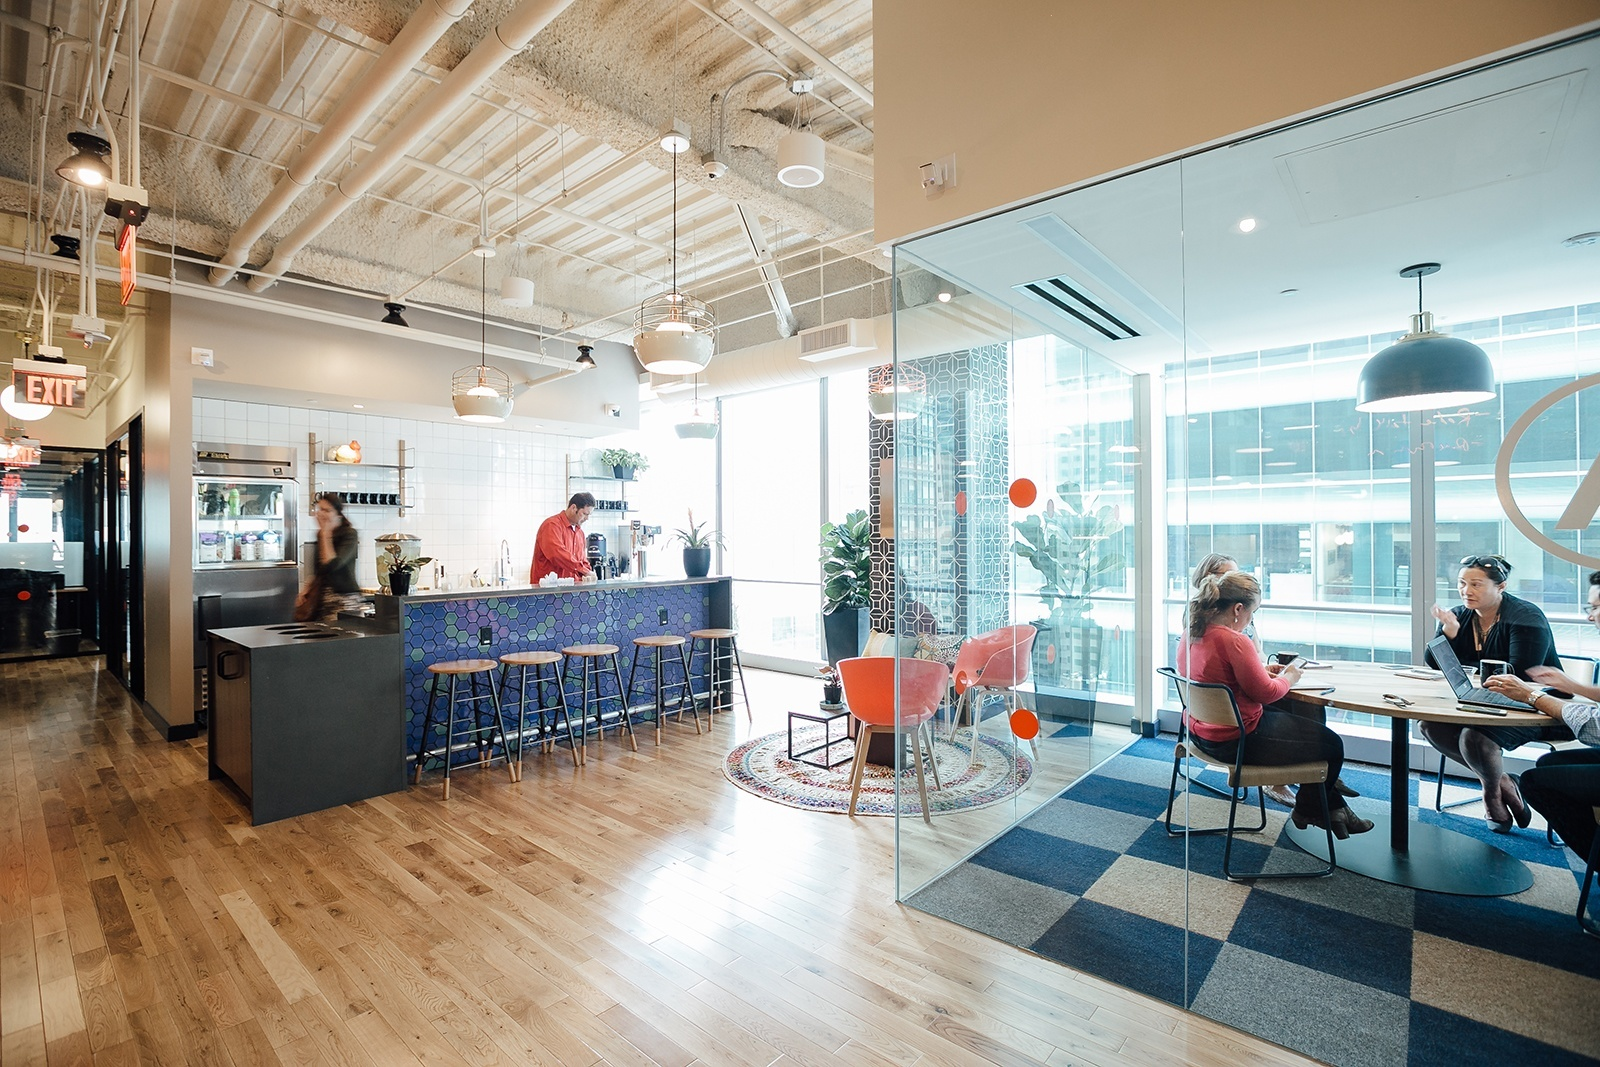 path san francisco office. WeWork, WeWork Membership Agreement, Primary Member, Overage Fees, Commitment Path San Francisco Office E